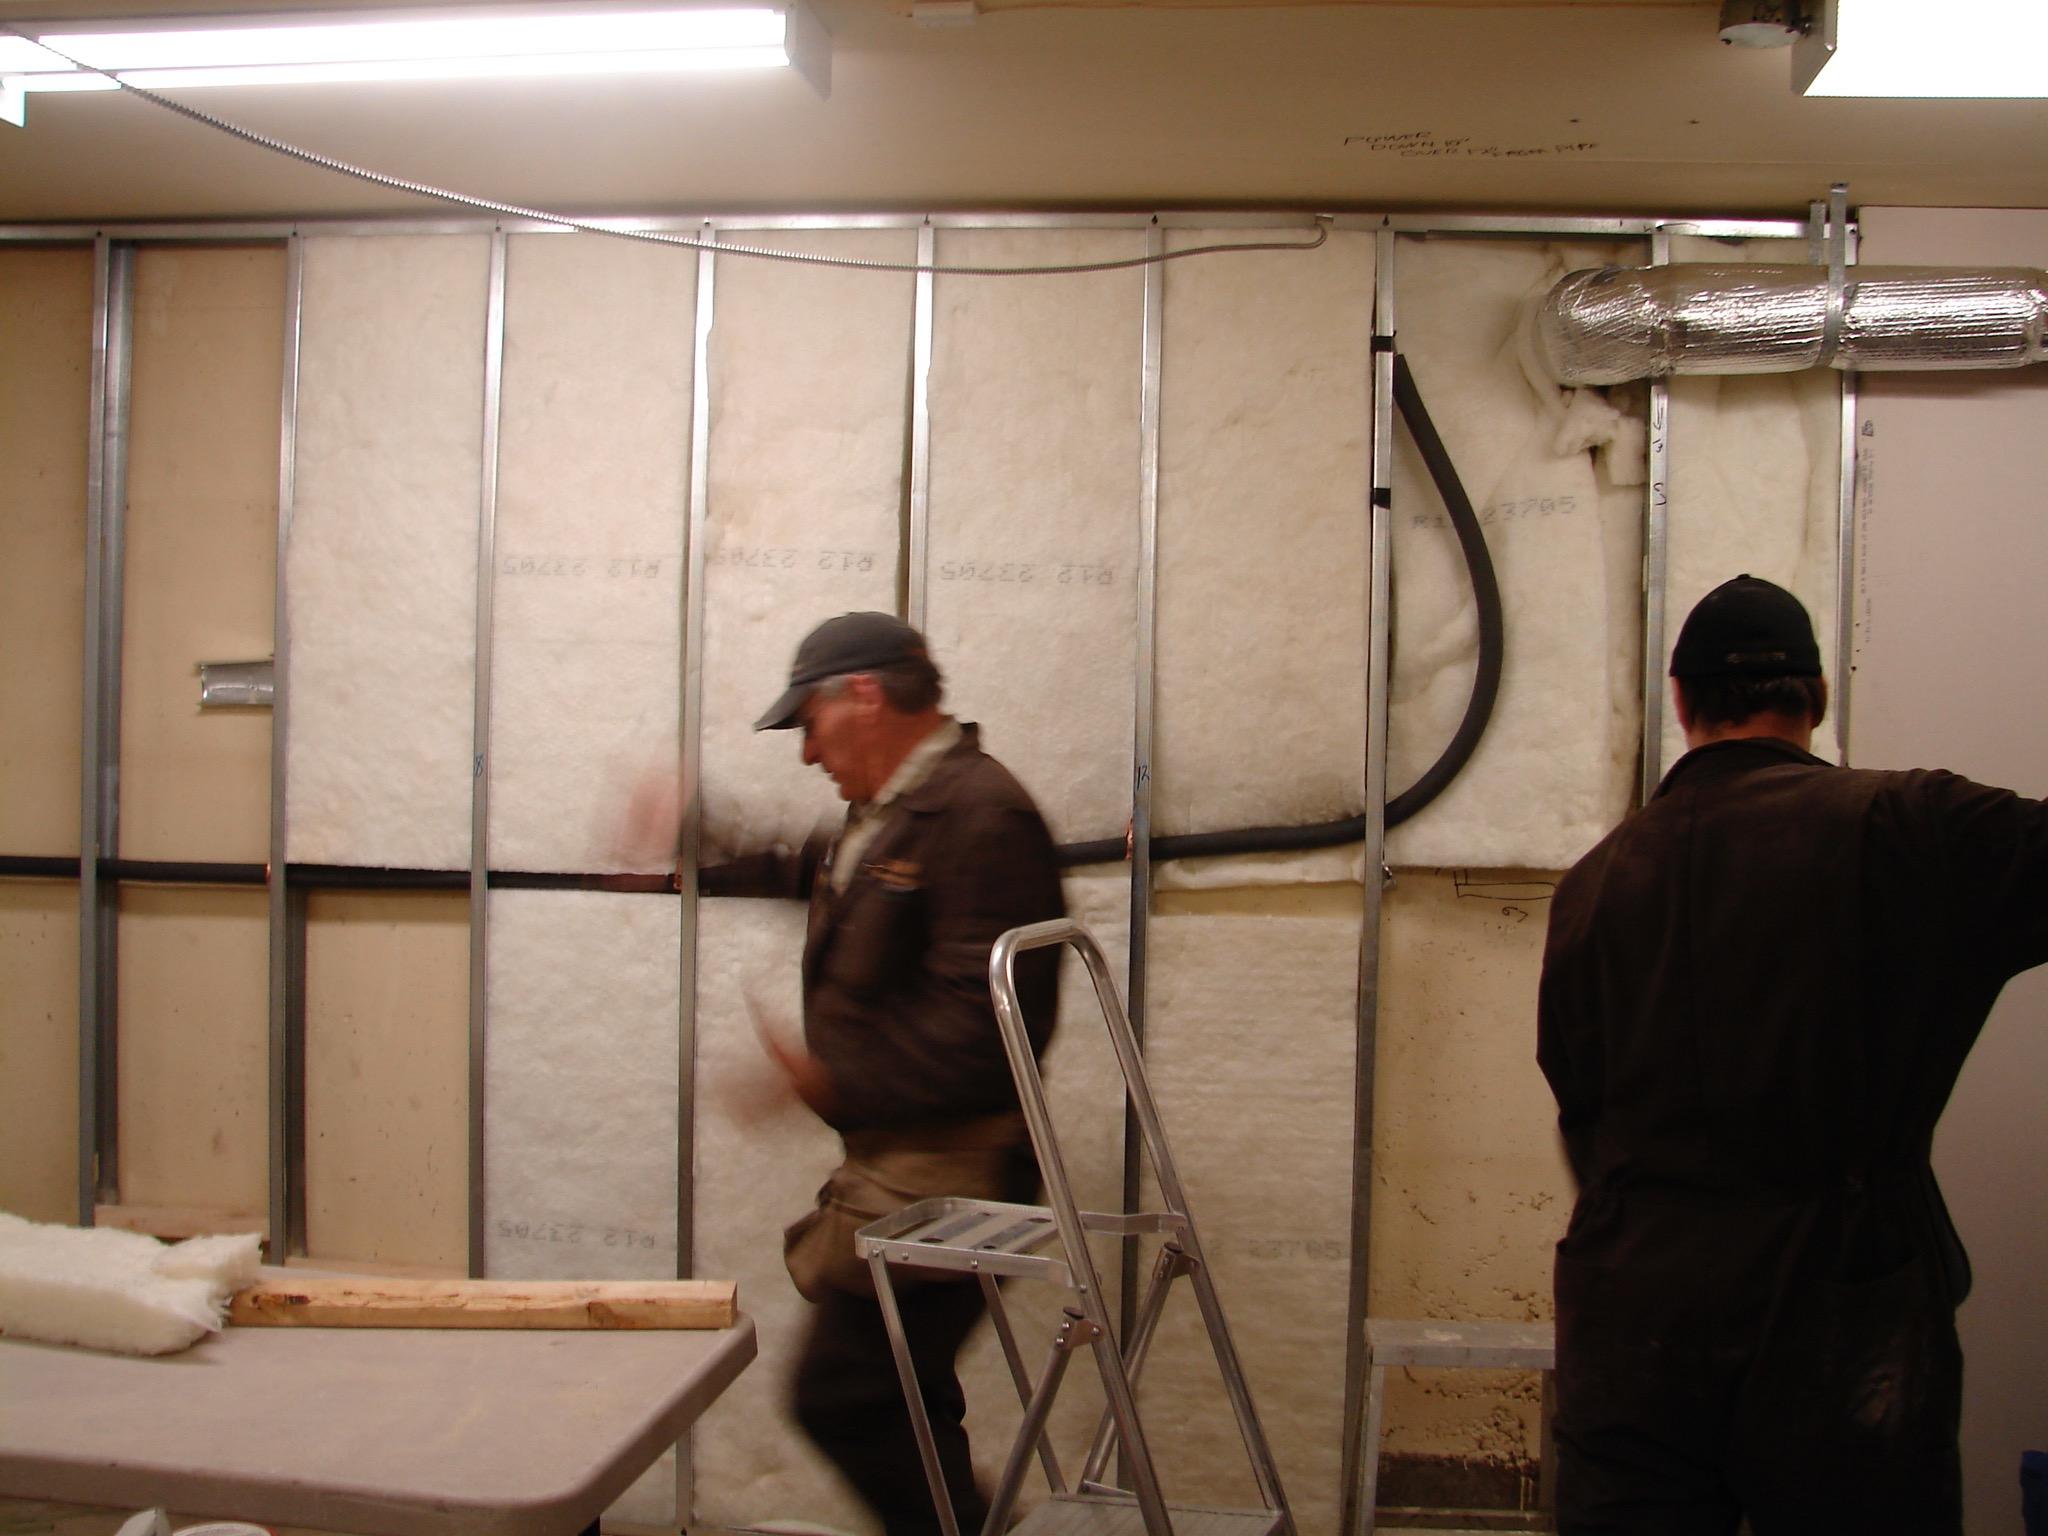 EL04  Electrical - General Contractors Commercial Renovations in Edmonton, Office and Warehouse Project Contractors